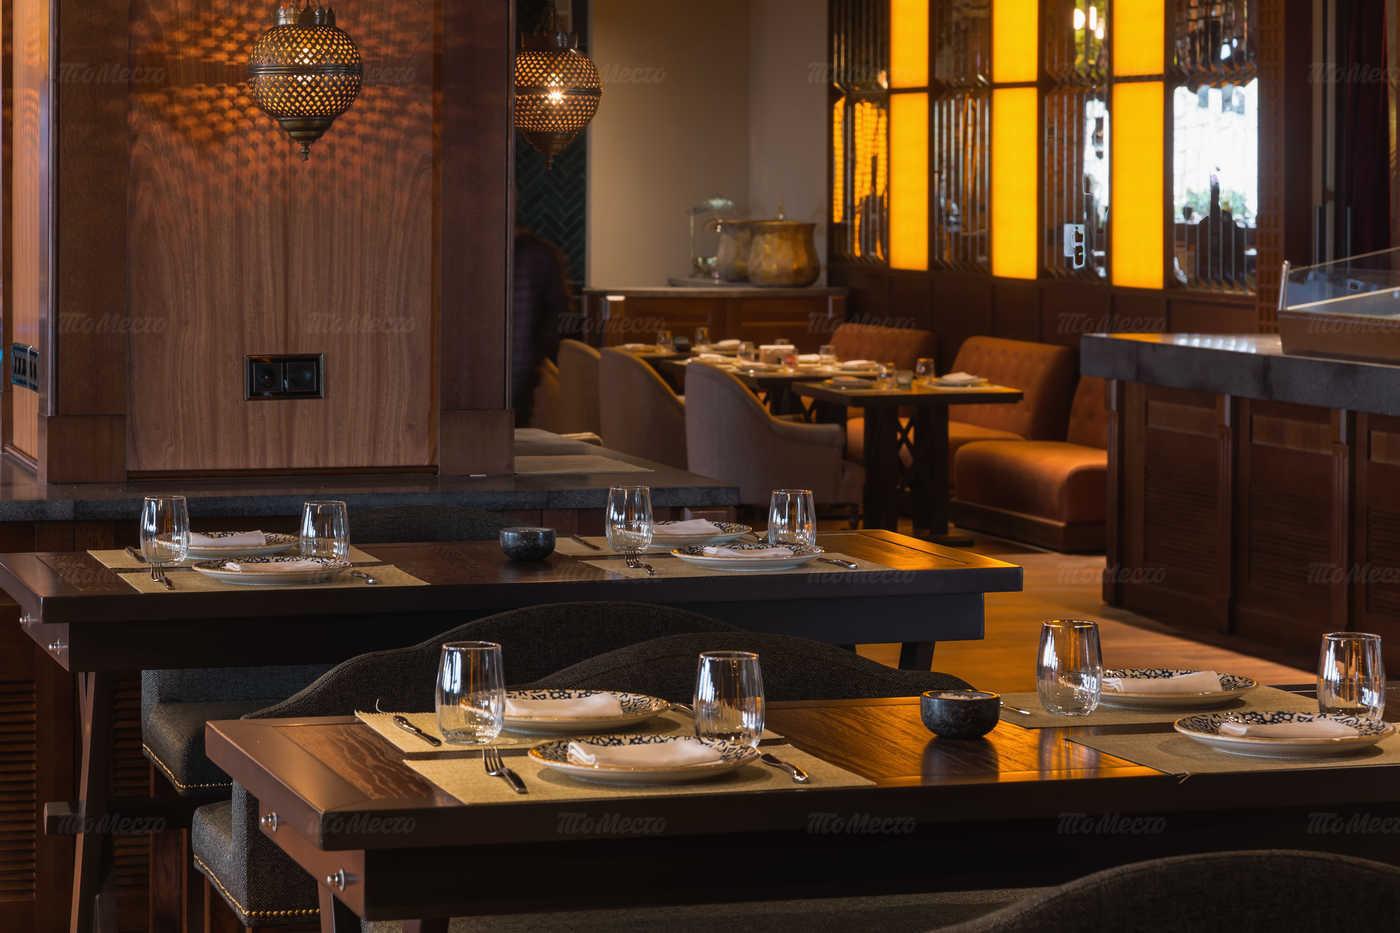 Ресторан Левантин (Levantine) на Новинском бульваре фото 7